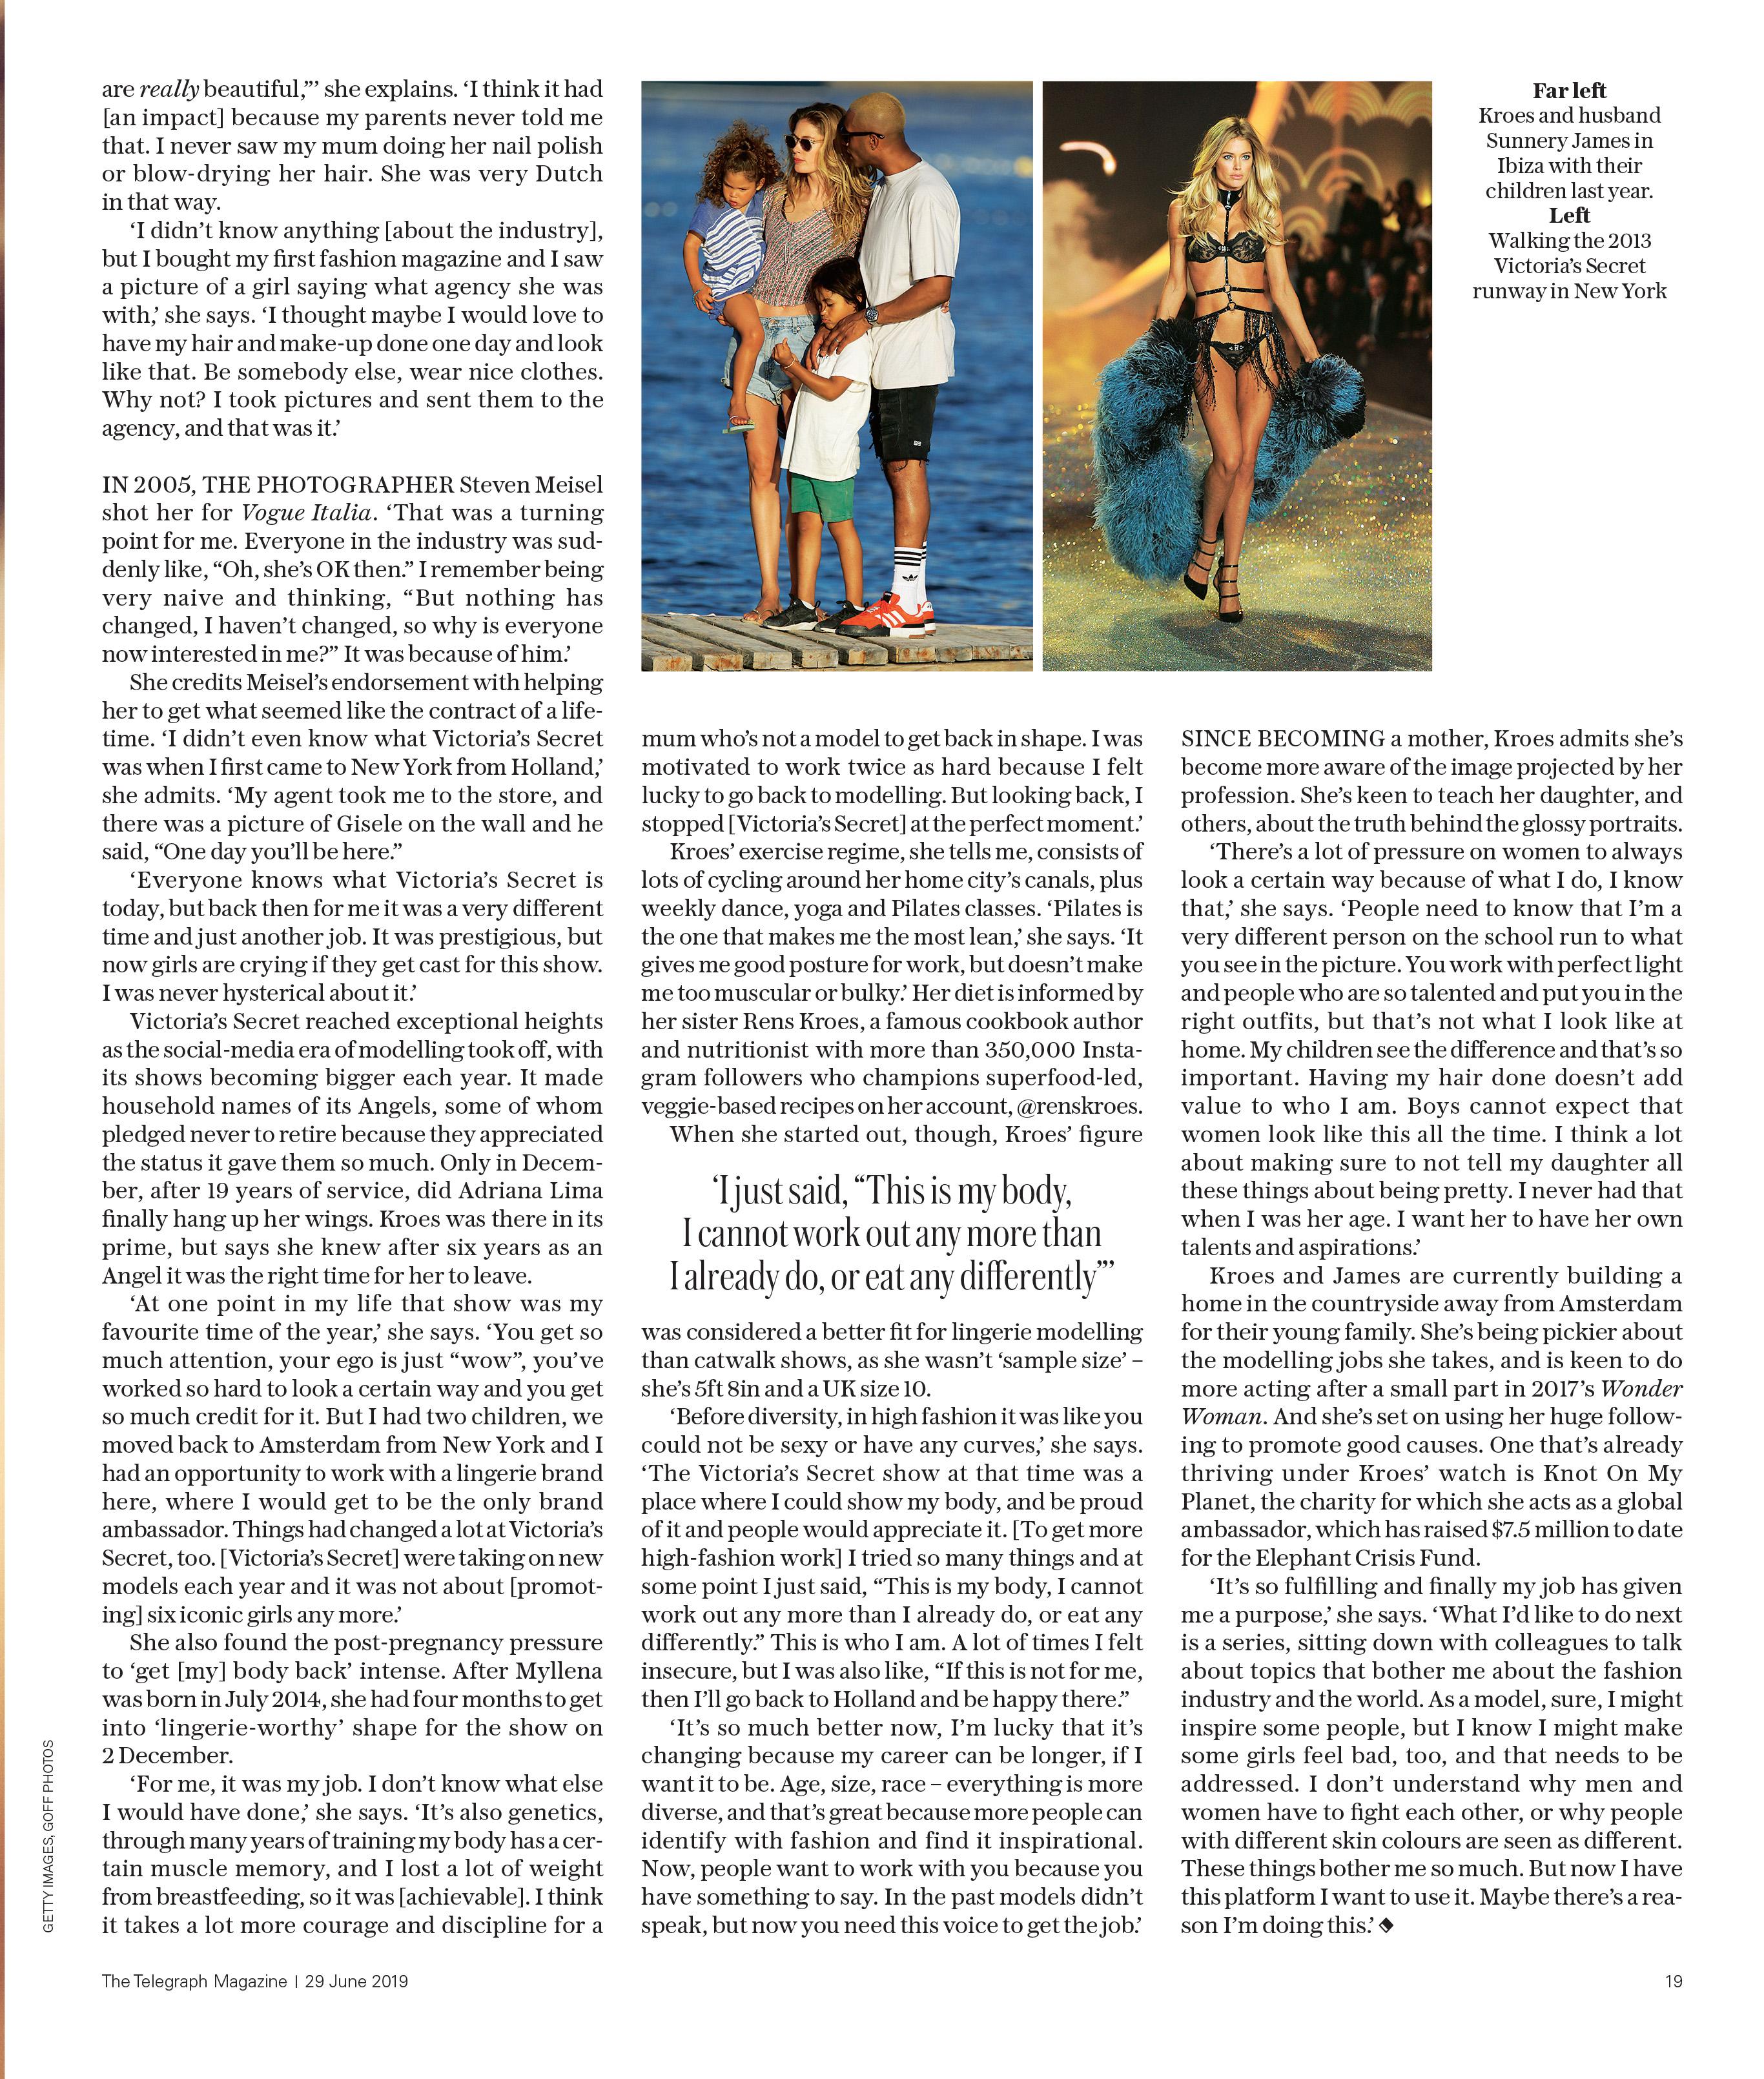 DOUTZENDaily Telegraph Magazine_29-06-2019_Main_1st_p19